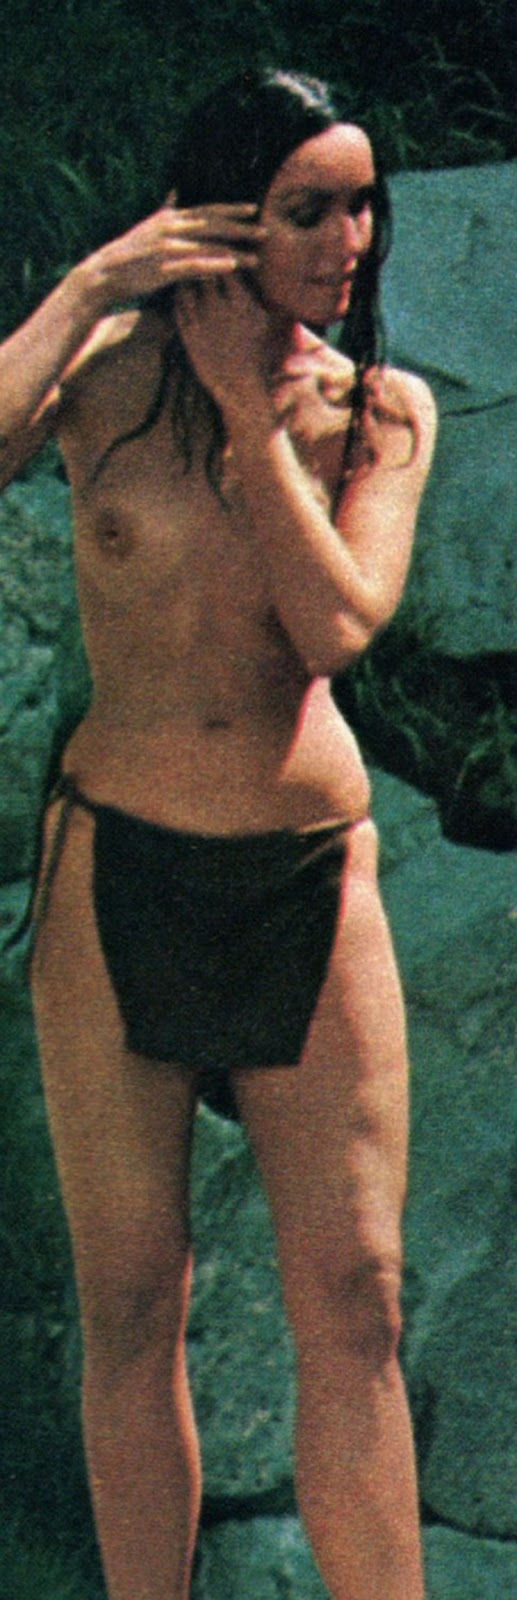 Julie newmar nude pics